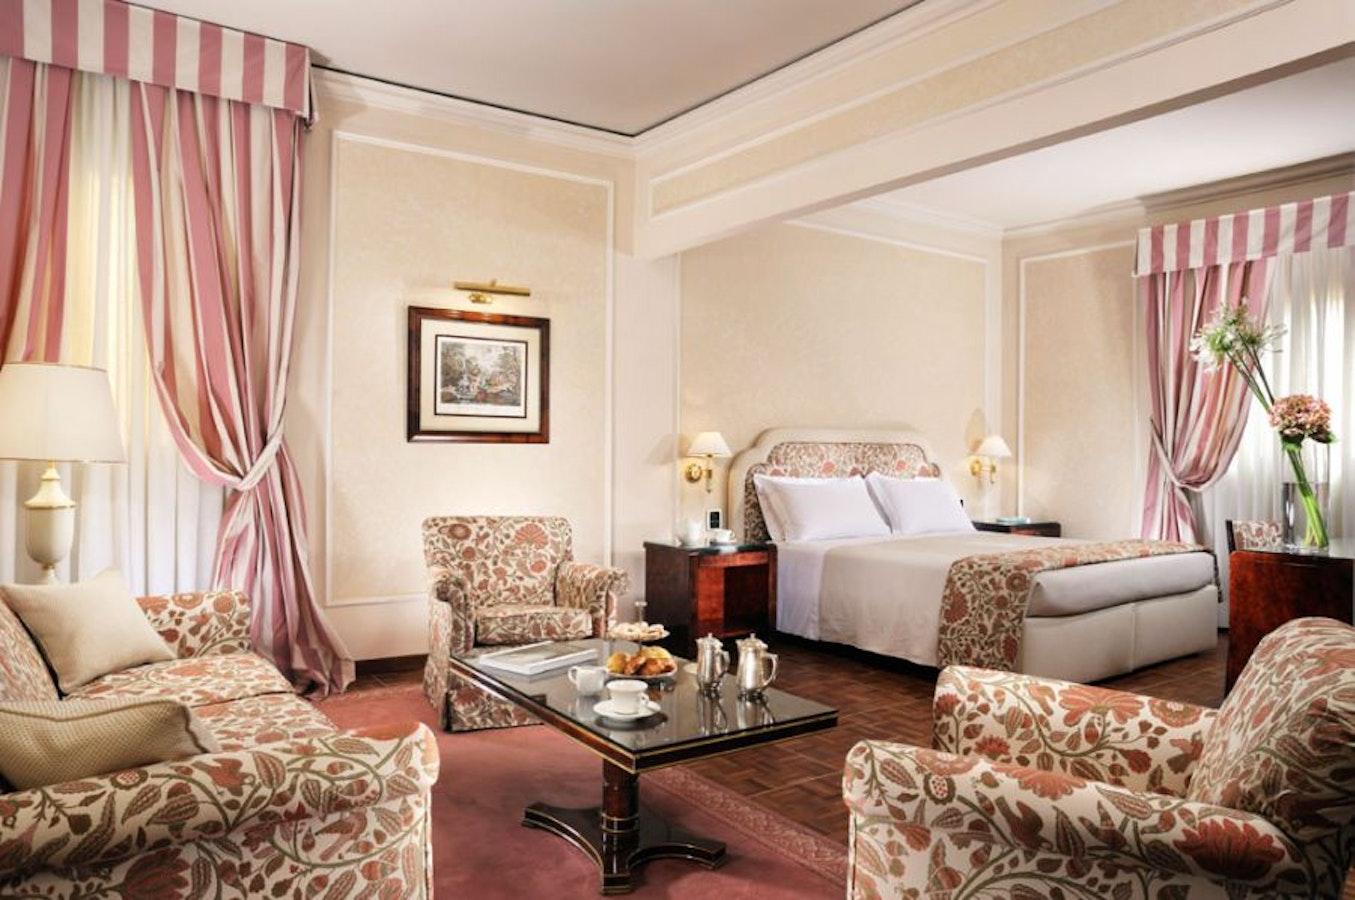 Hotel de la Ville Florence Central 4 Star Luxury Acommodation